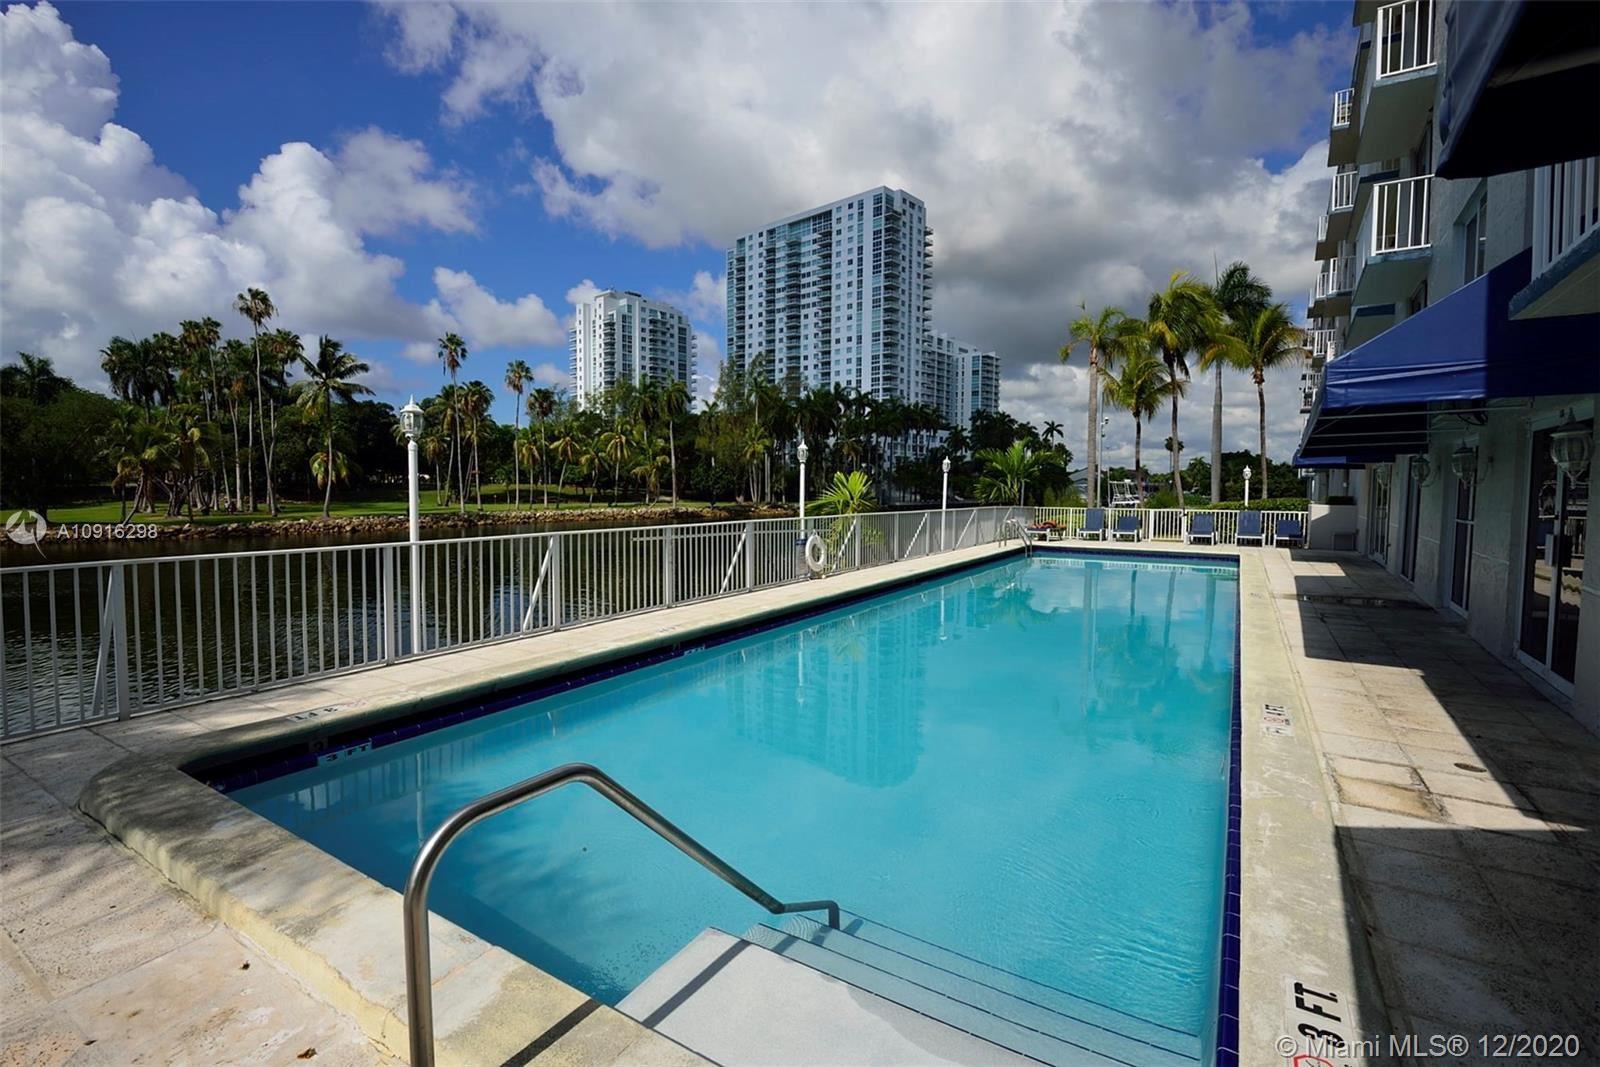 1720 NW N River Dr #311, Miami, FL 33125 - #: A10916298